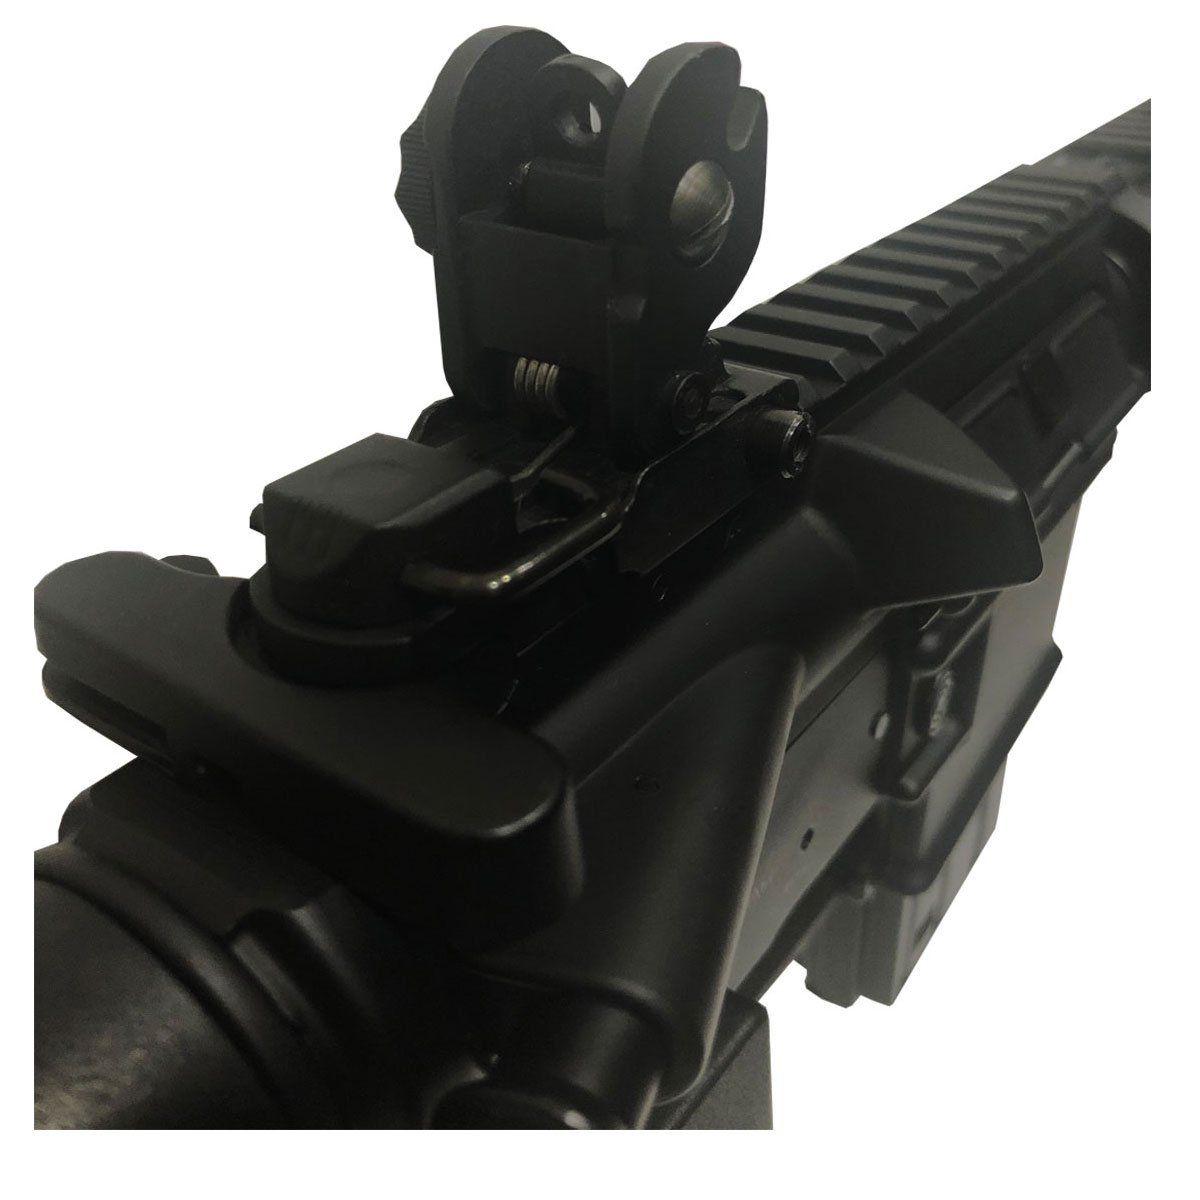 Rifle de Airsoft D-Boys M16A4 SPR Full Metal Elétrico